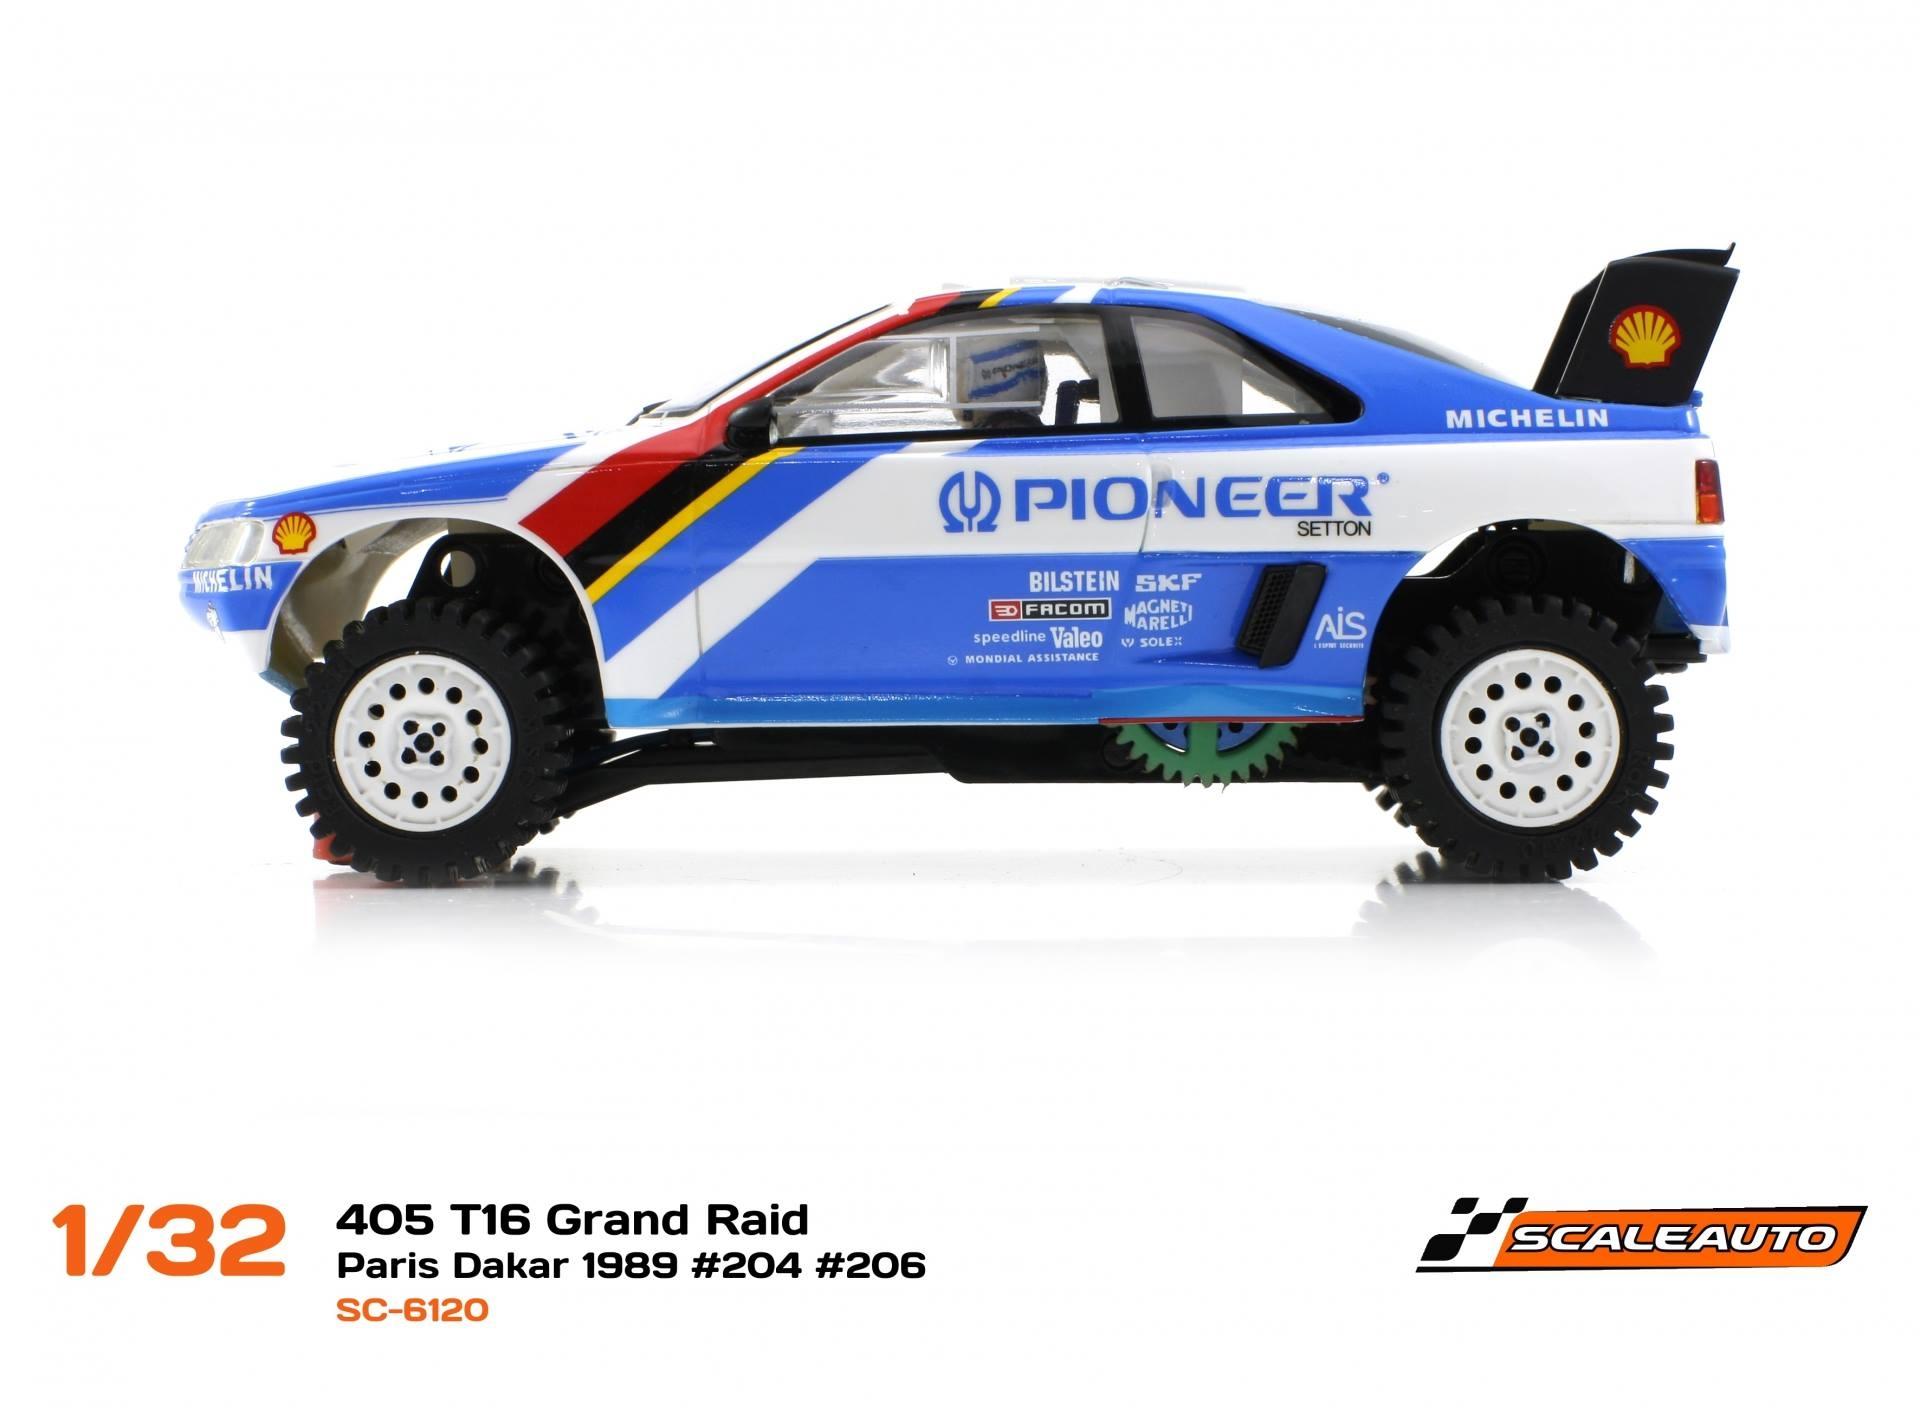 "Scaleauto : la Peugeot 405 T16 grand raid ""vainqueur"" Paris Dakar 1989"